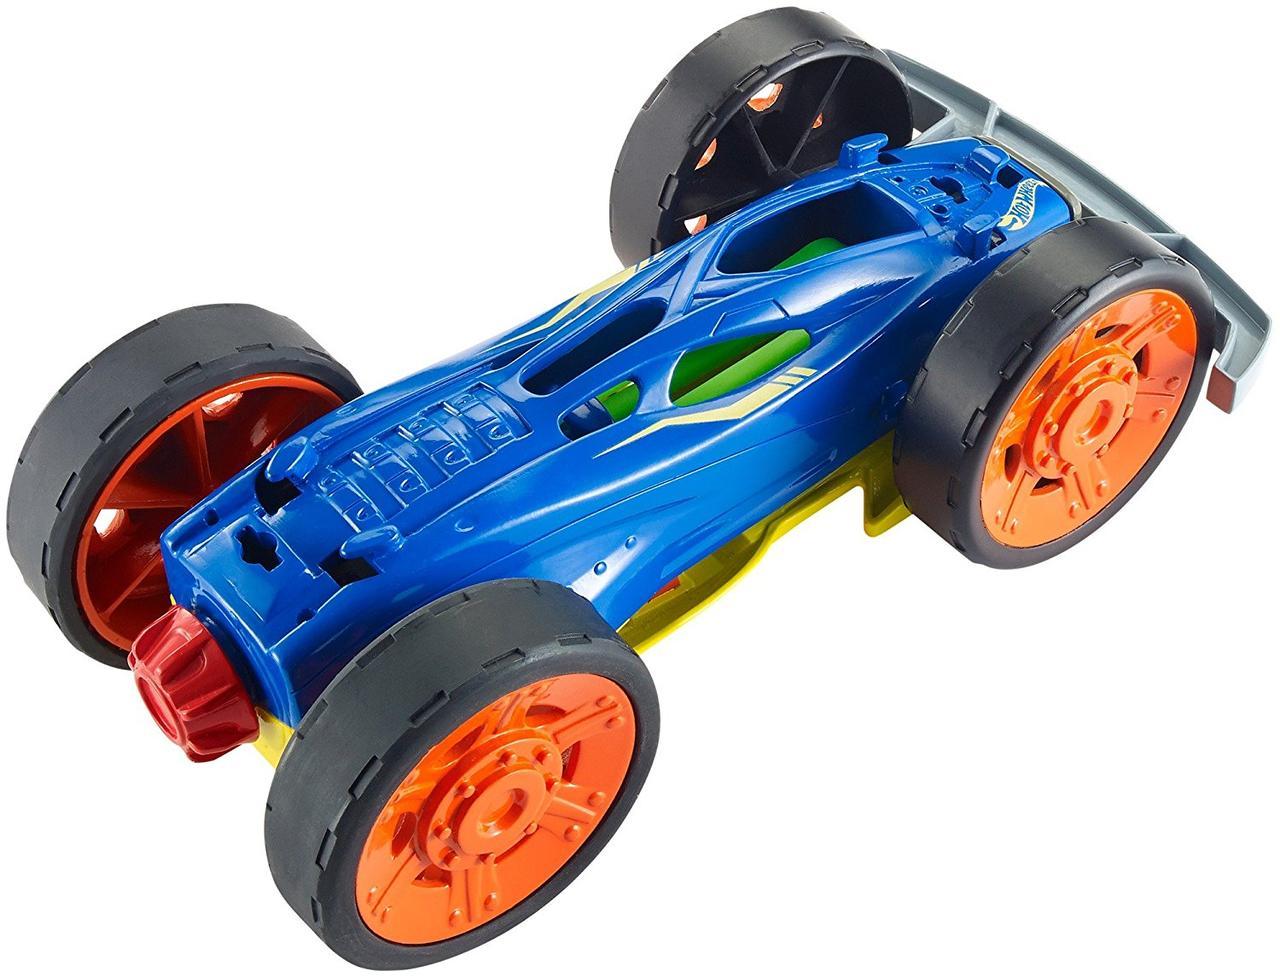 Hot Wheels Большая гипермашинка-трансформер Турбоскорость Speed Winders Twisted Backflip Vehicle